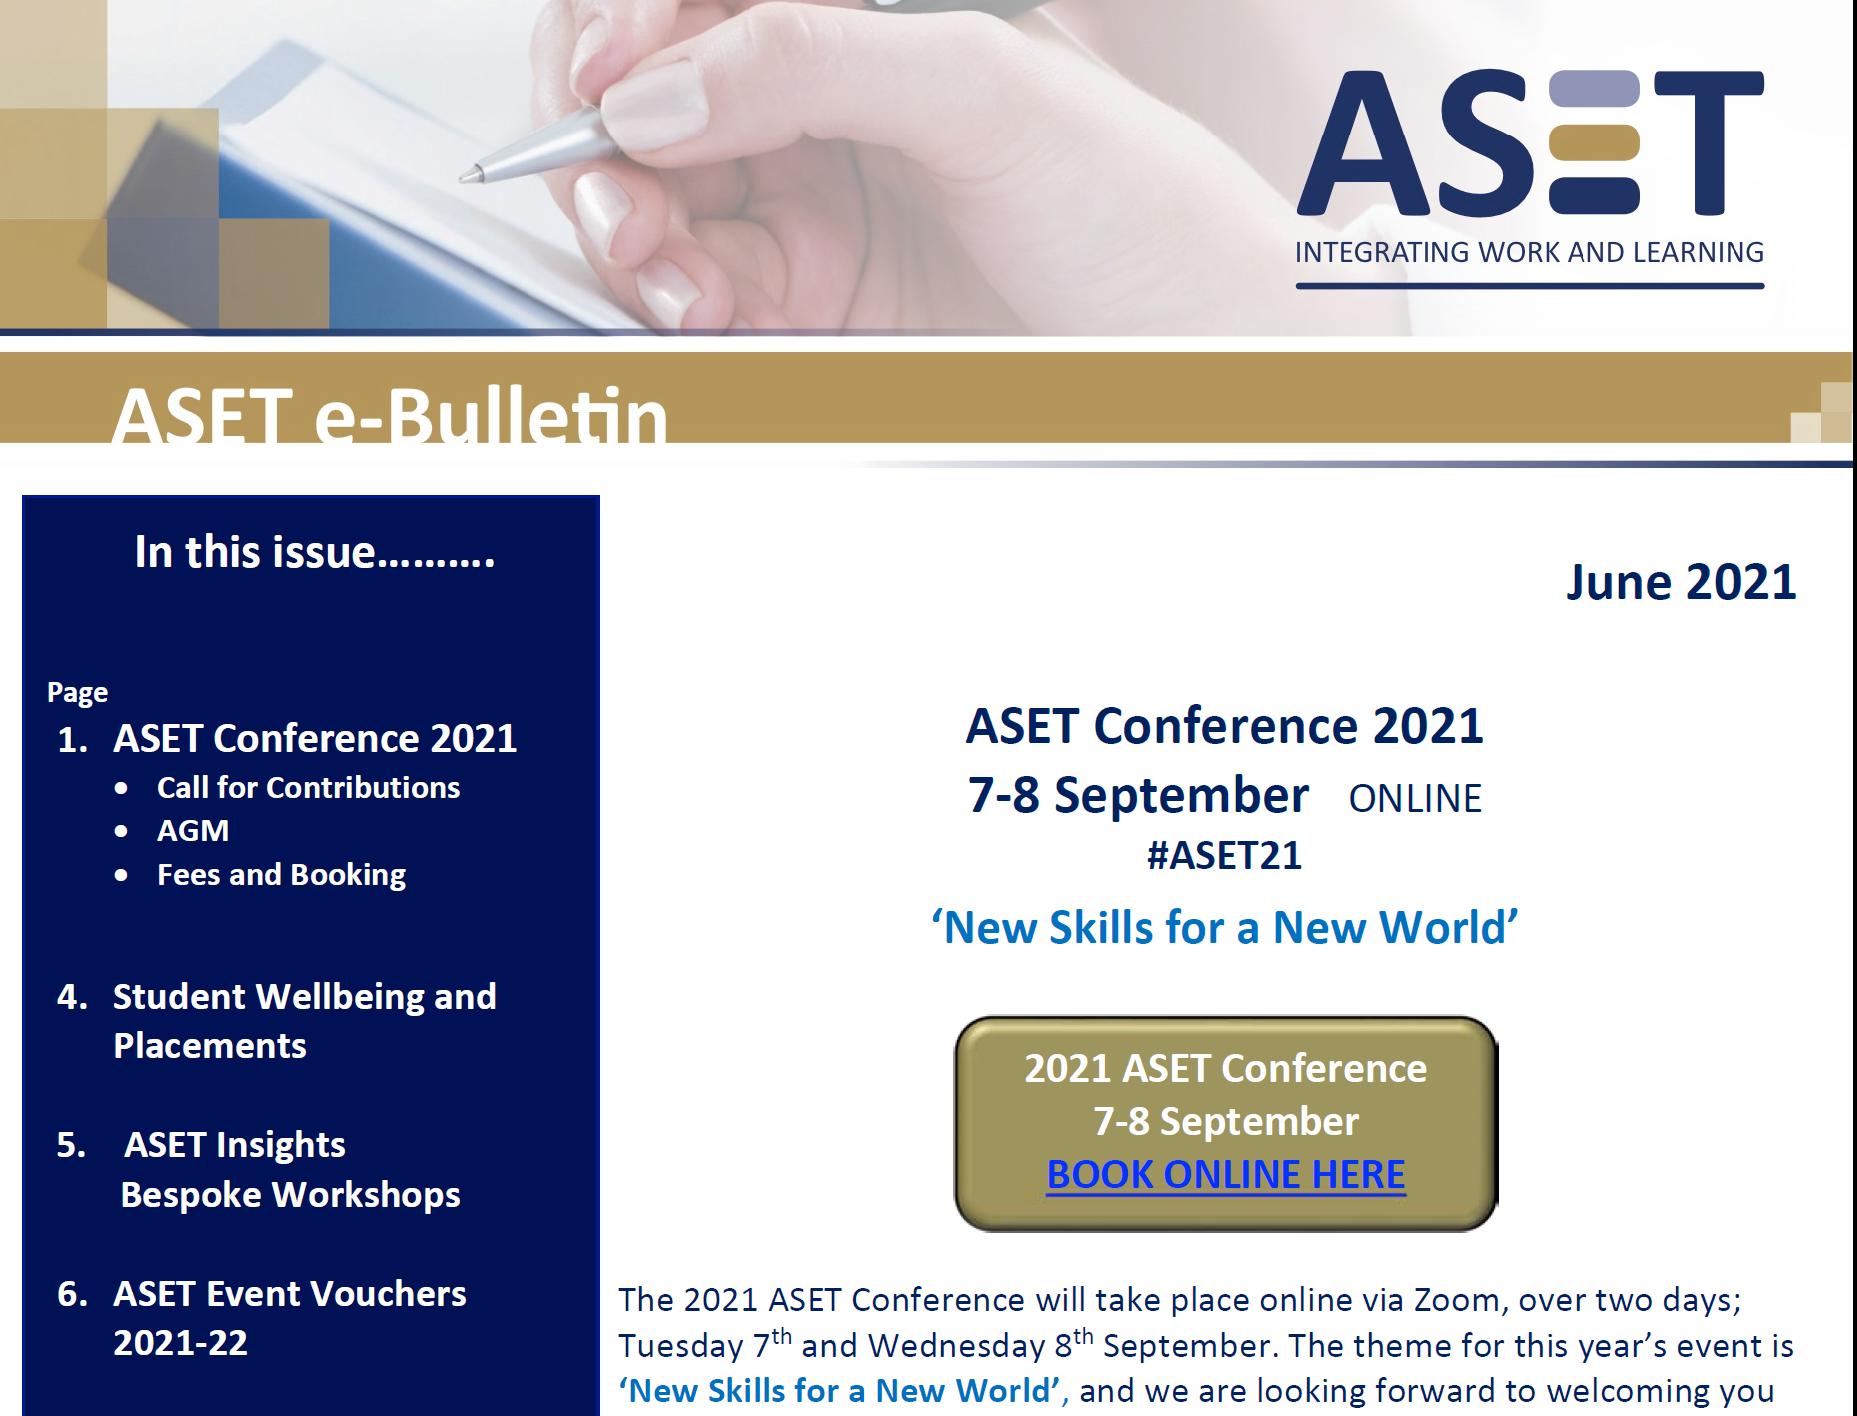 ASET Members' e-Bulletin June 2021 - ASET